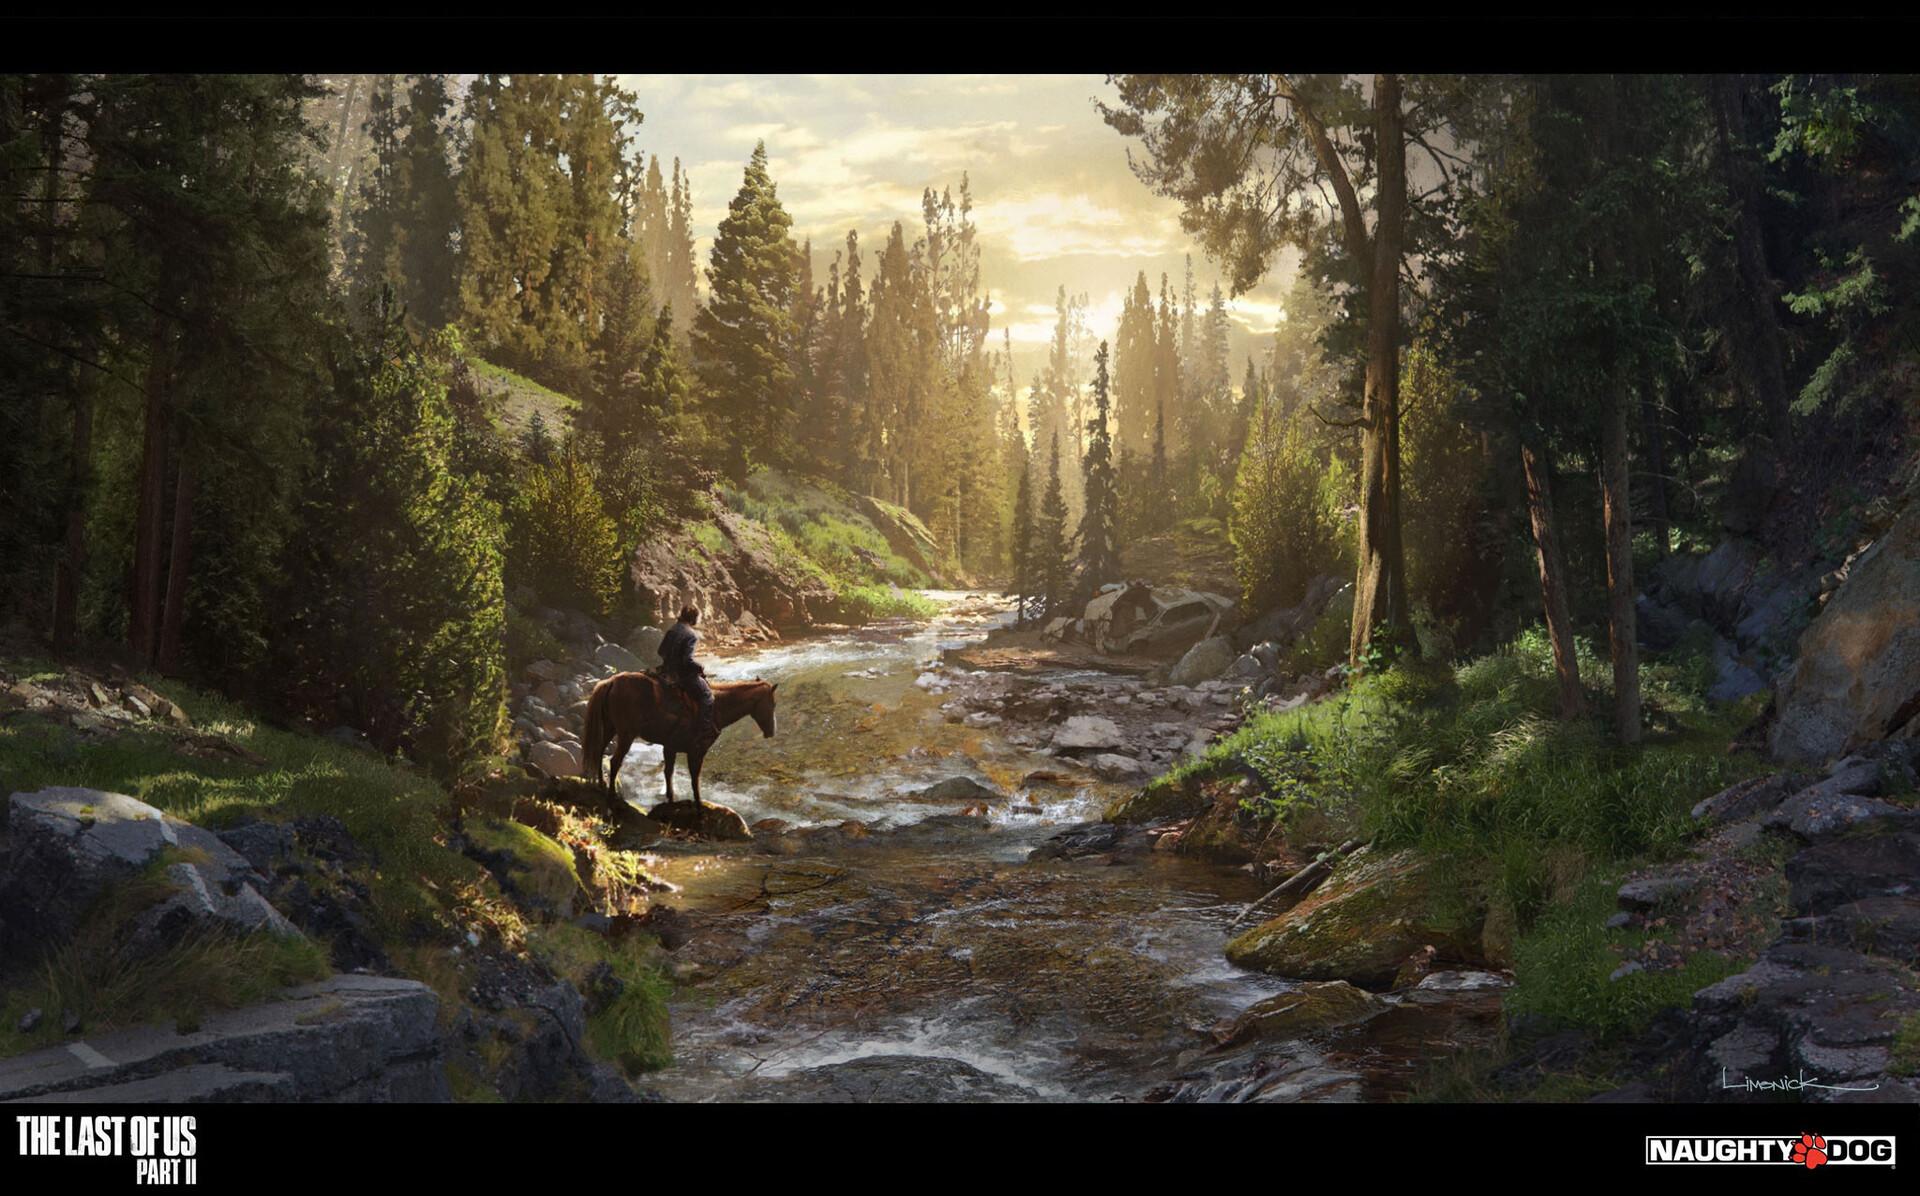 aaron-limonick-prologue-river-1.jpg